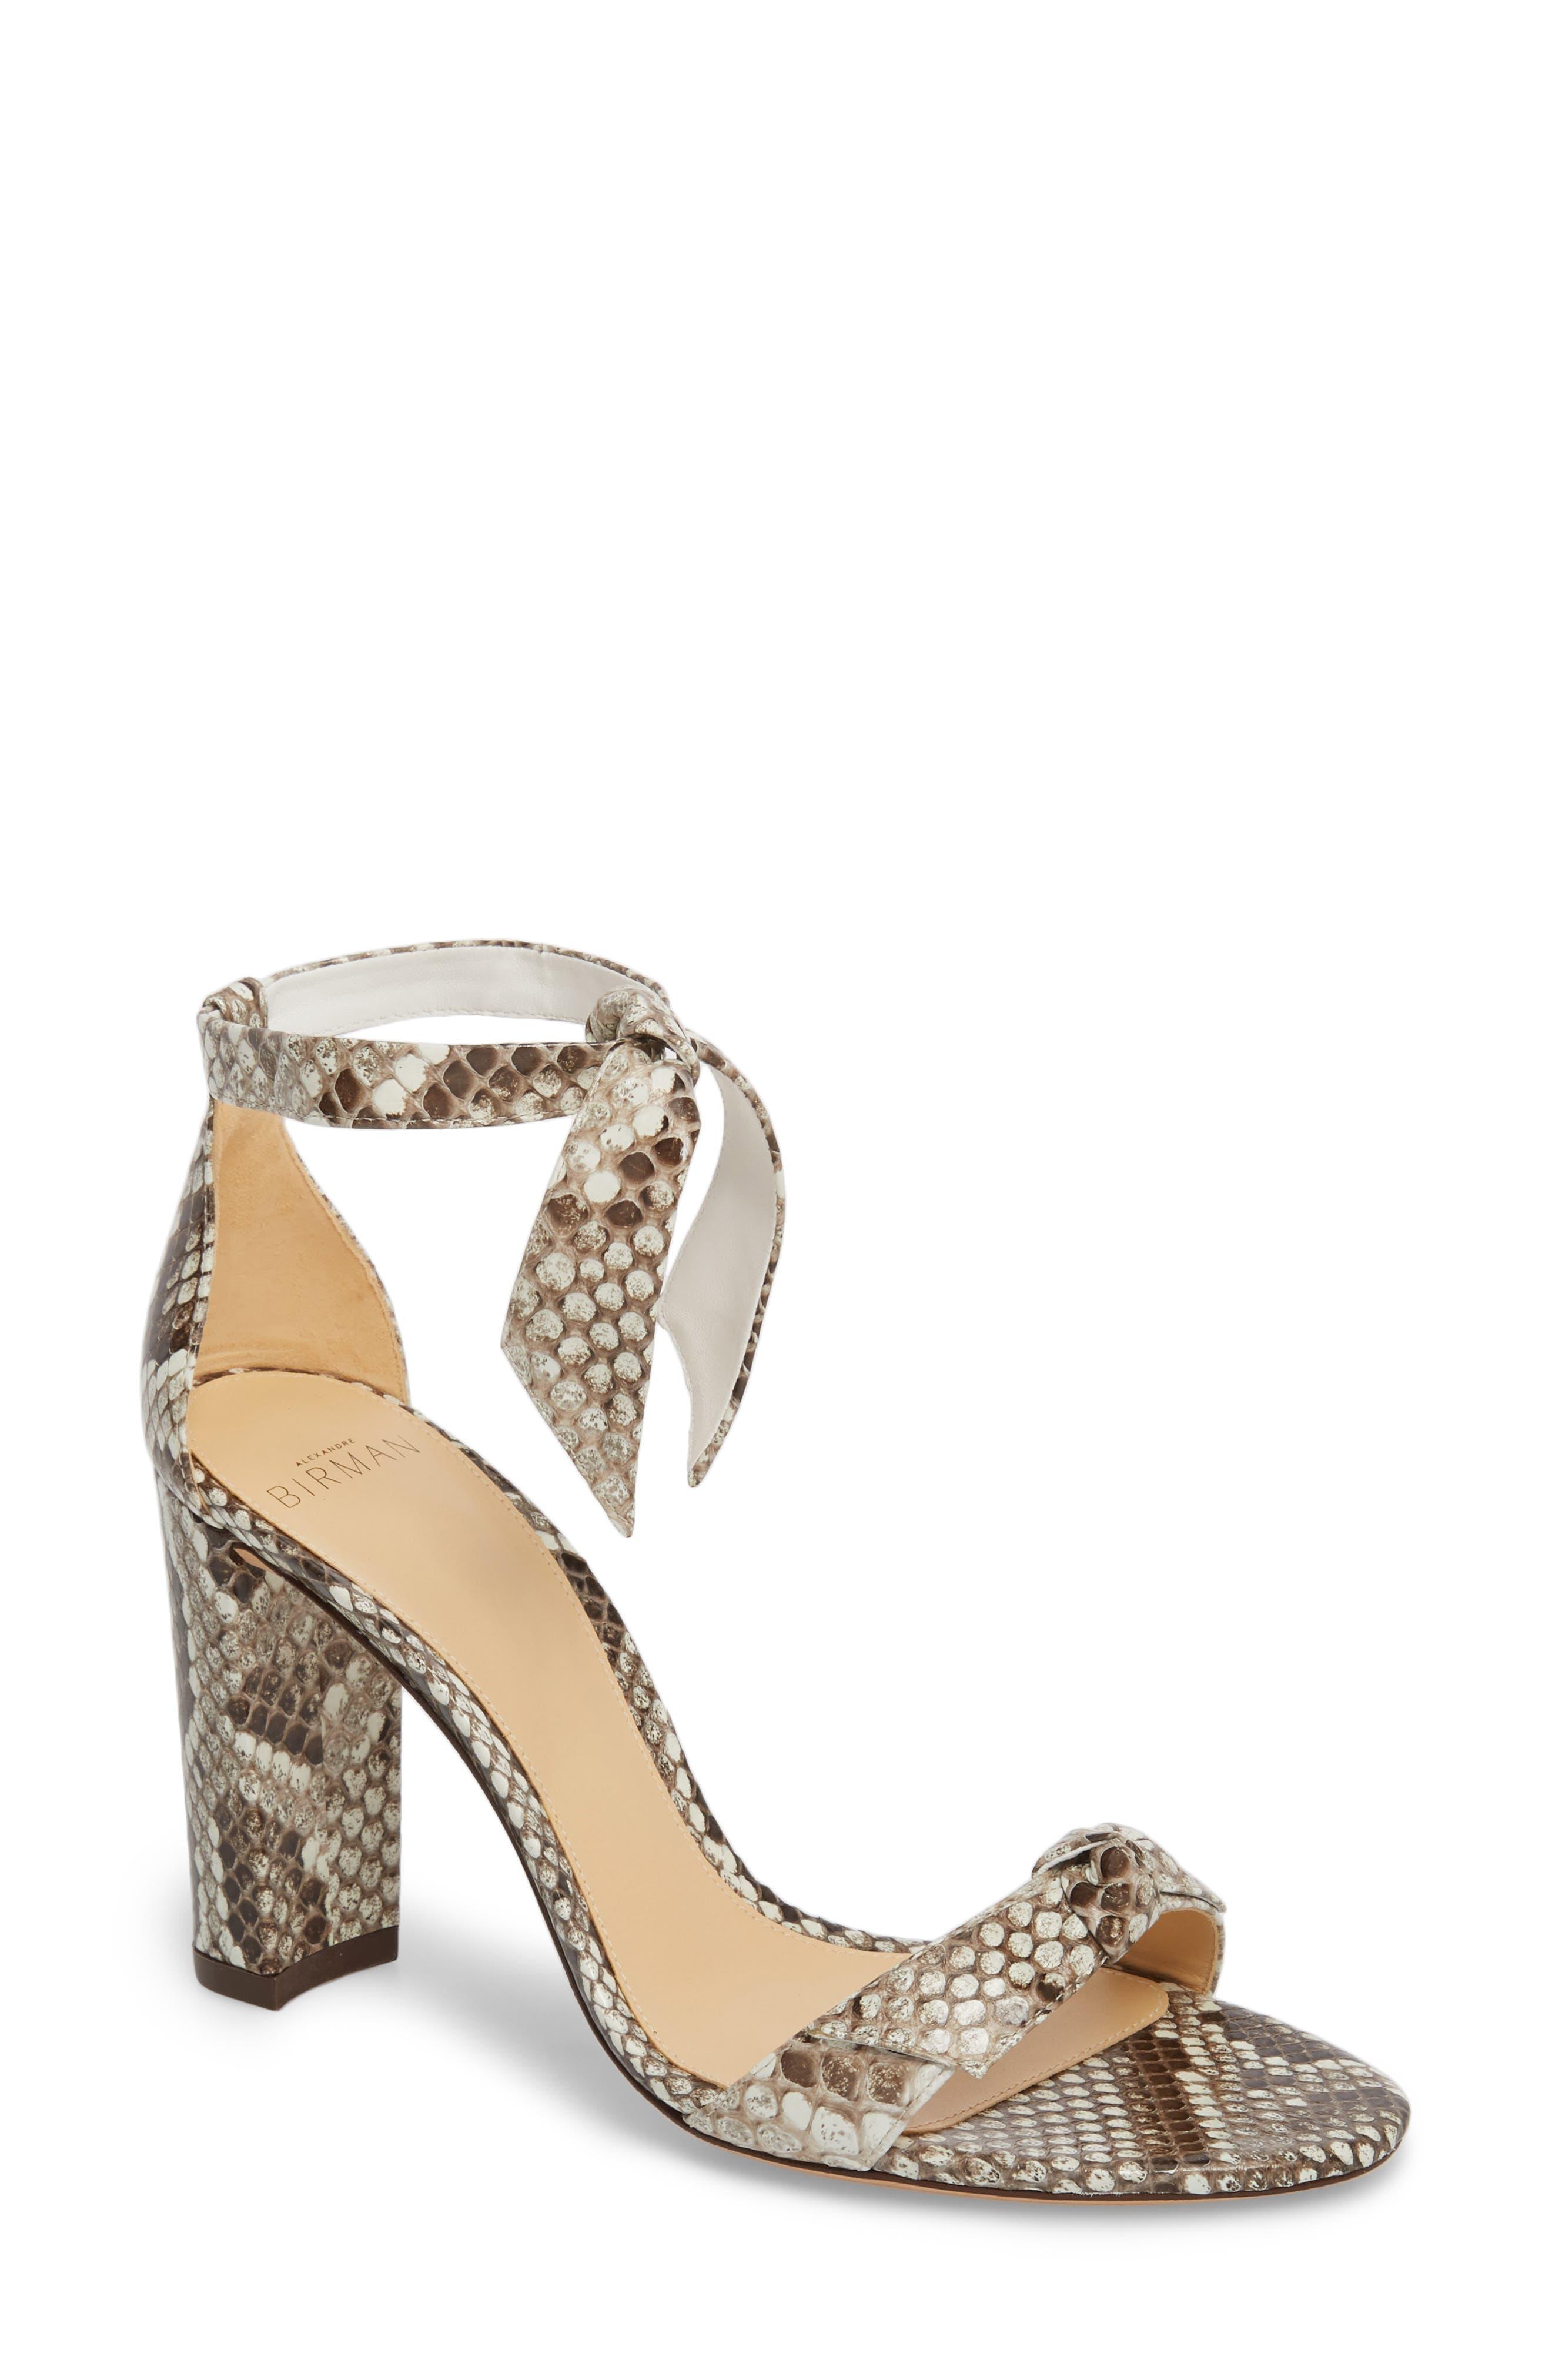 Clarita Genuine Python Ankle Tie Sandal,                             Main thumbnail 1, color,                             250